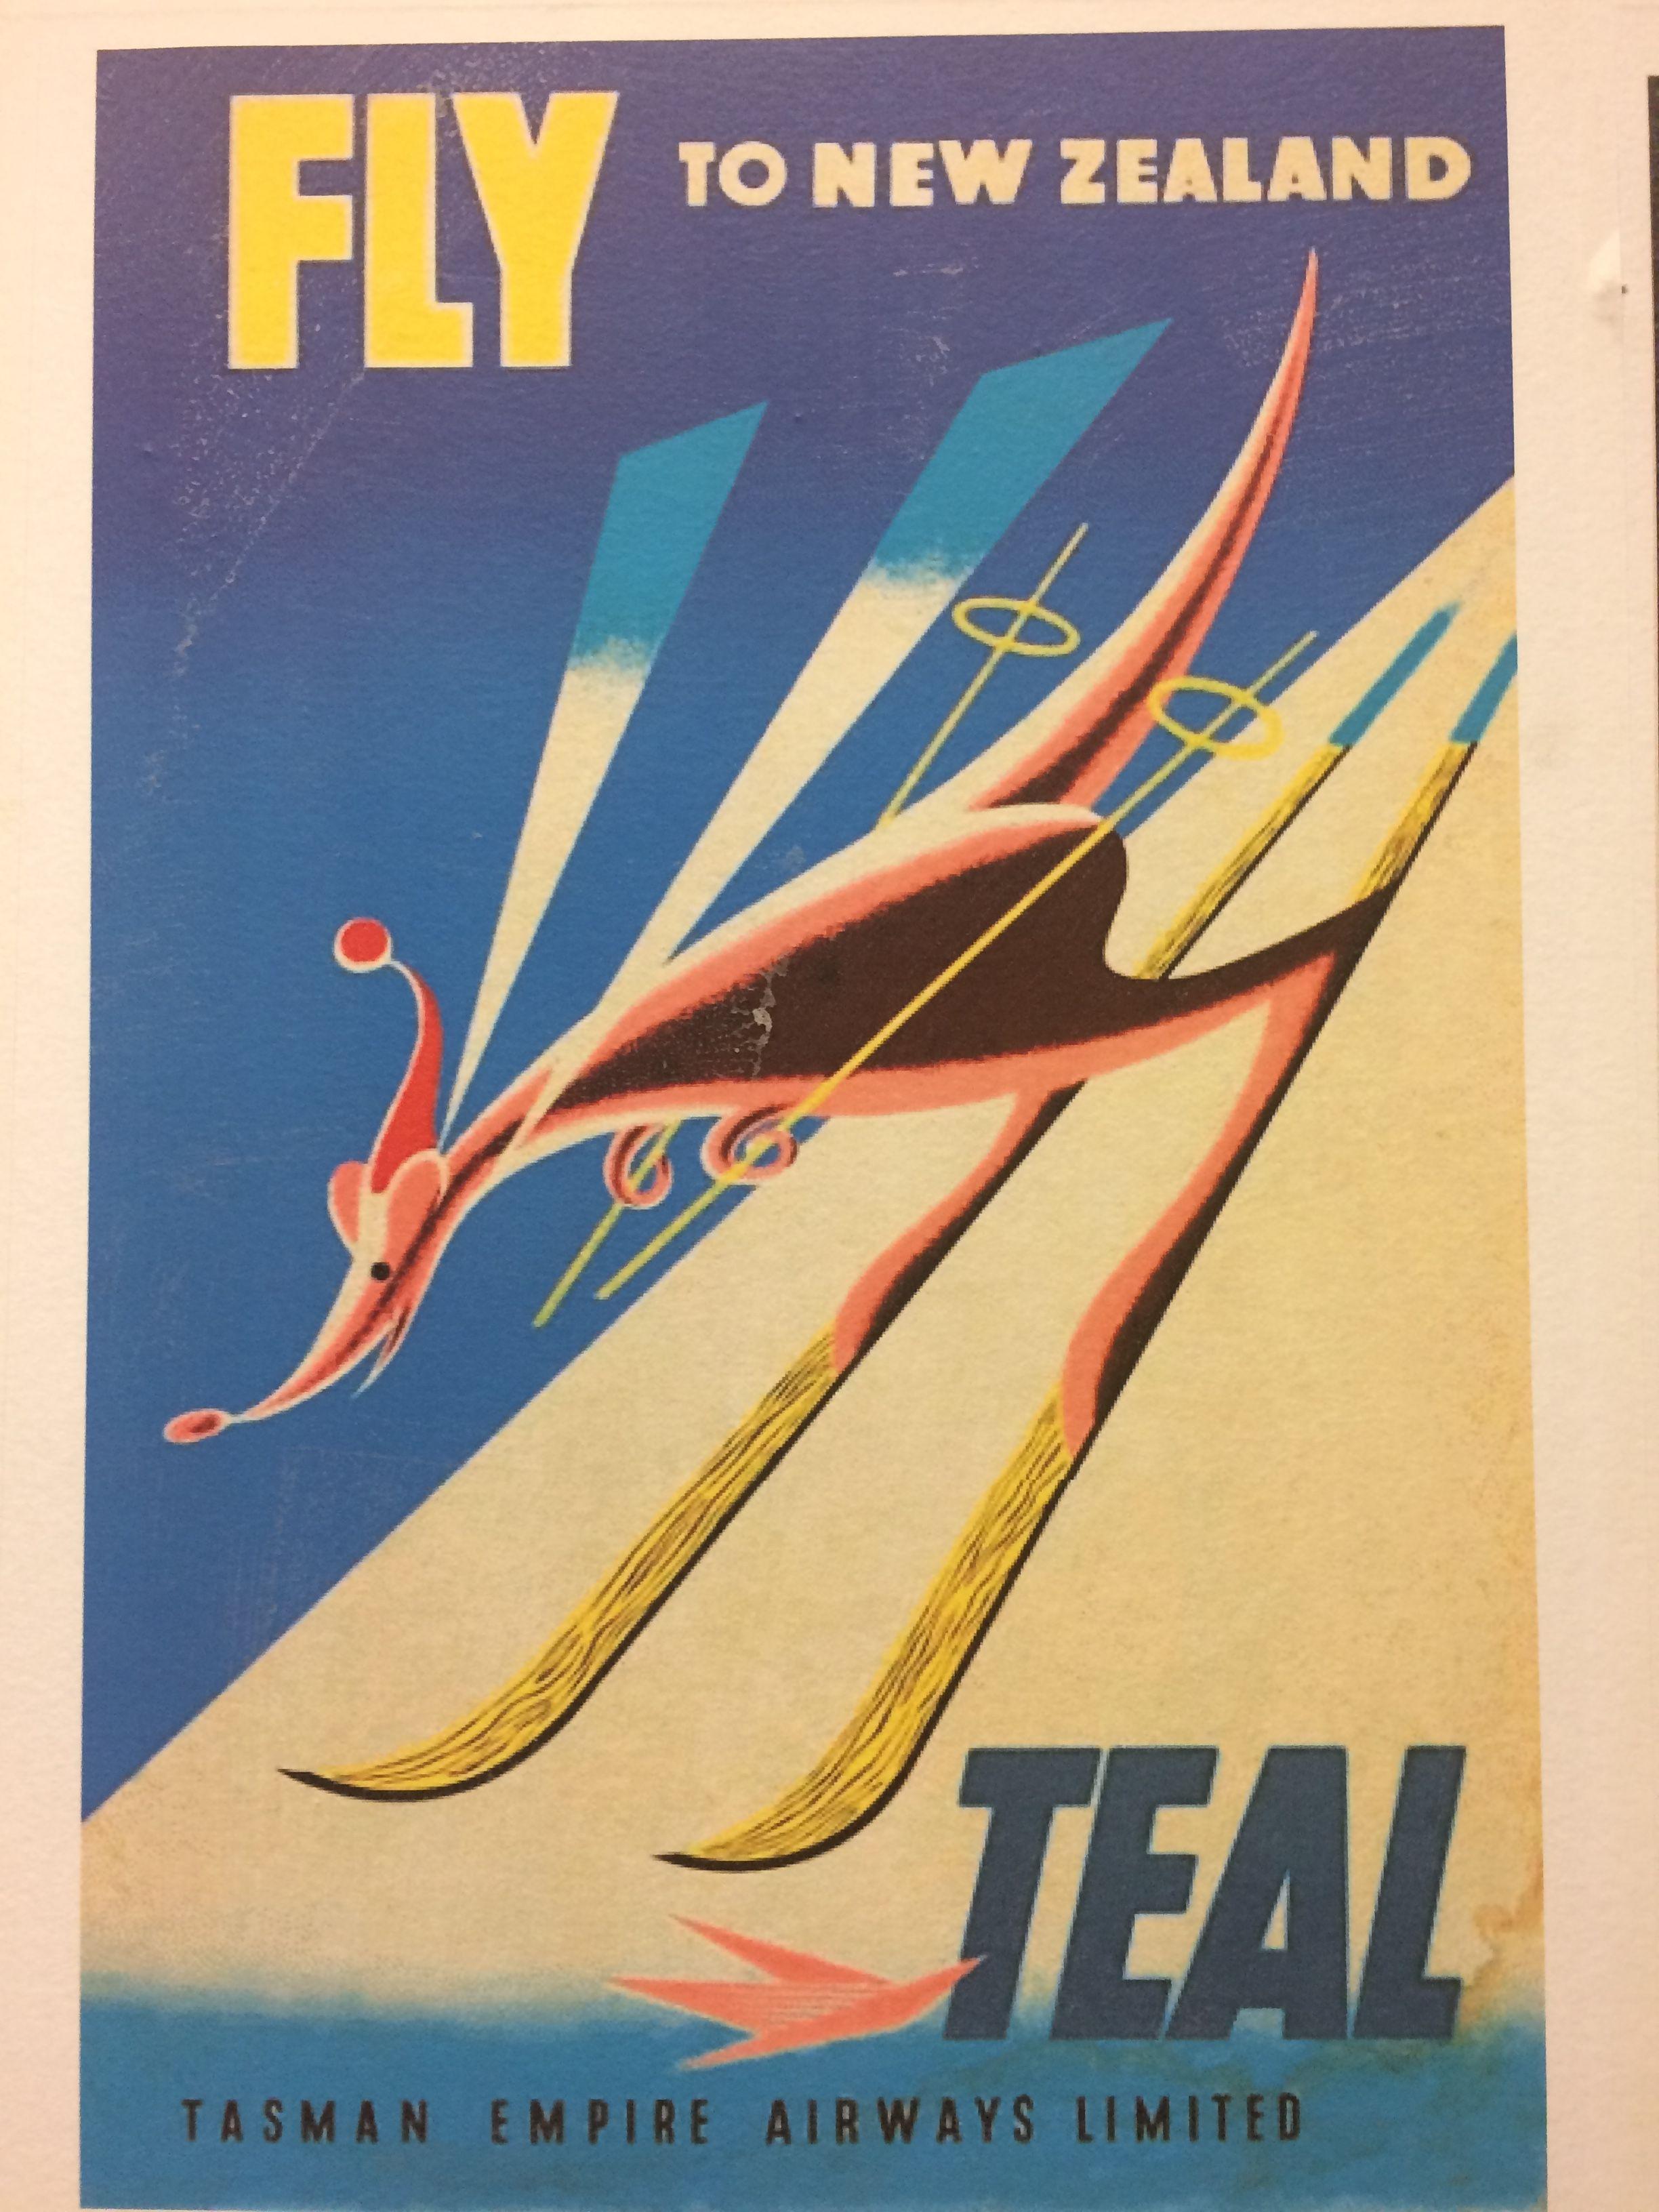 20x30 Sunshine /& Surf 1930s Australian Vintage Style Travel Poster